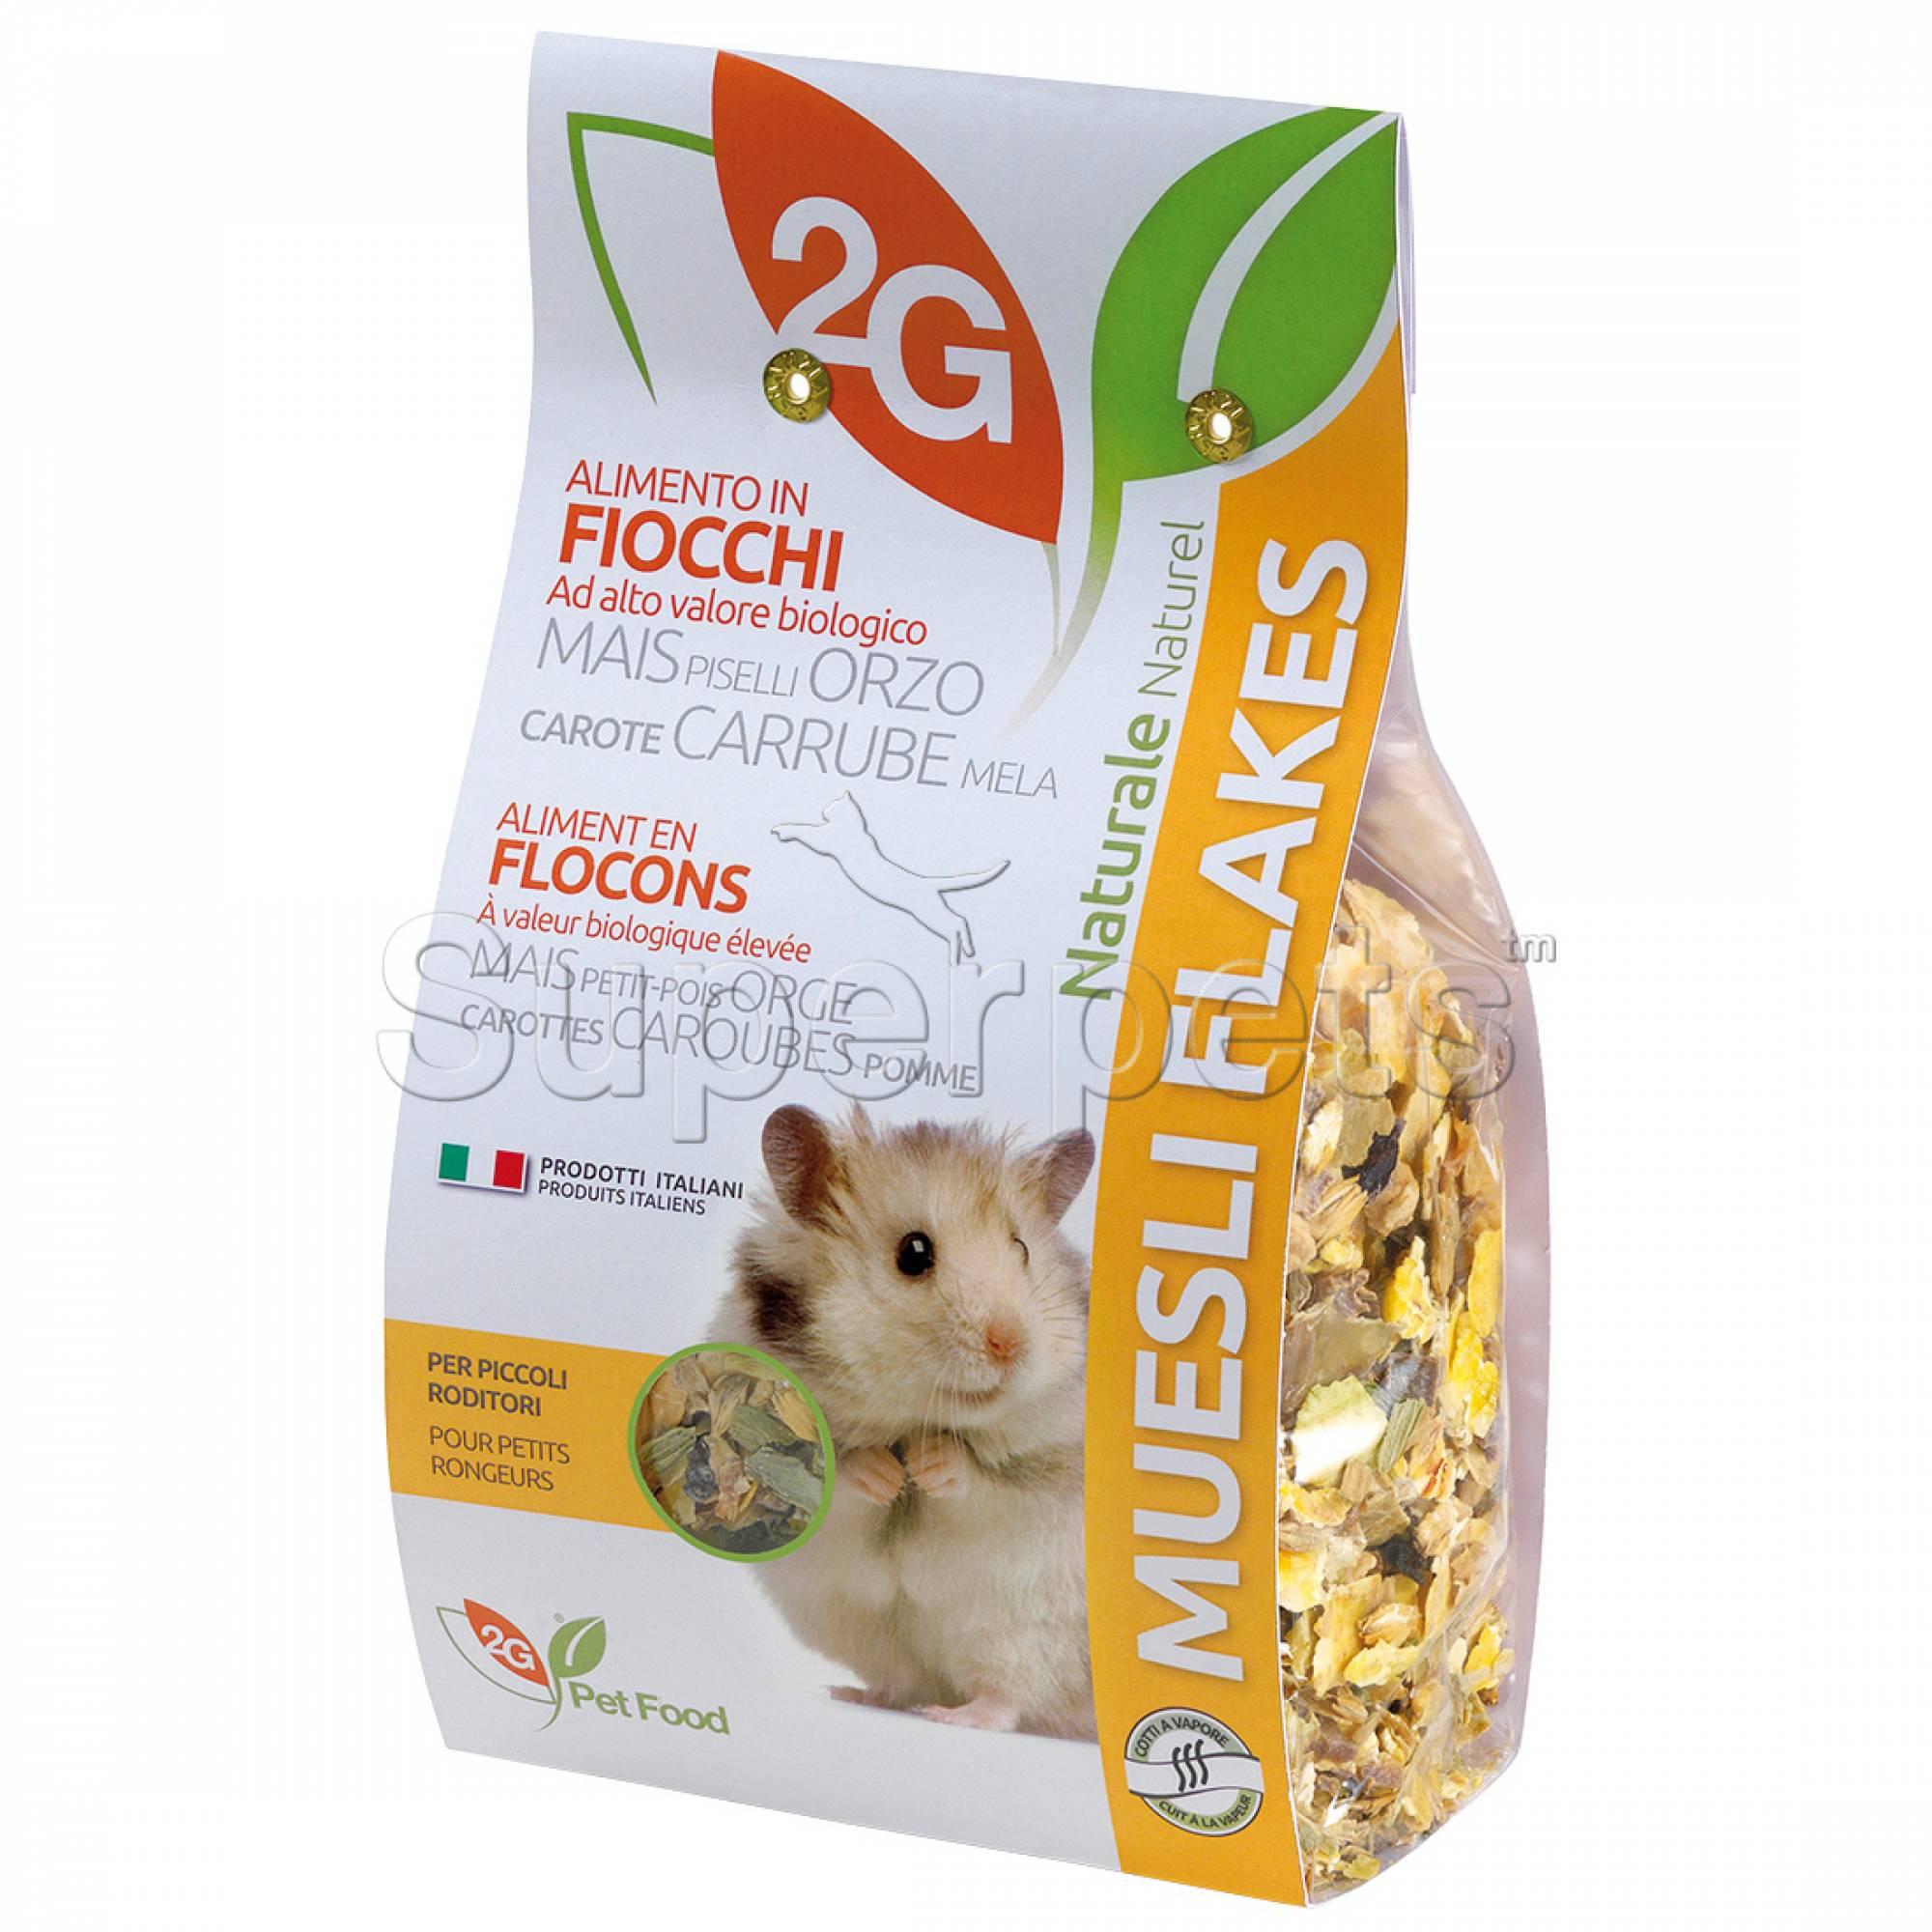 2G Pet Food - Muesli Flakes 350g